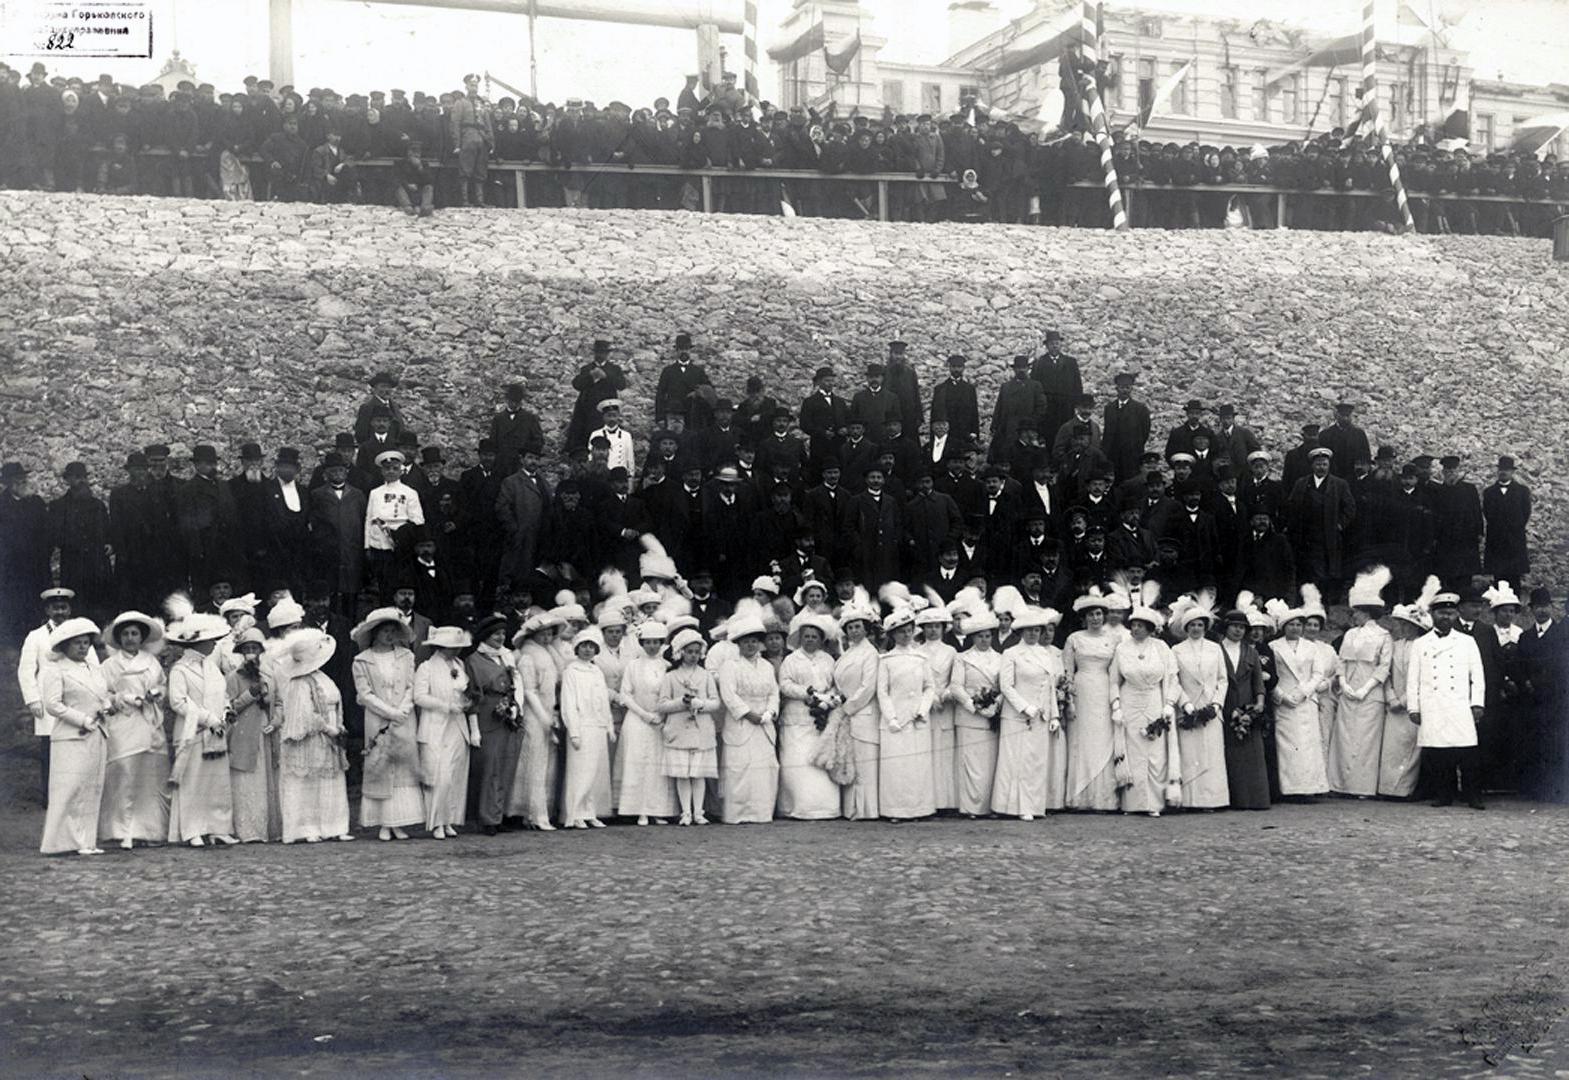 Группа дворянства и купечества при встрече Николая II. 1913